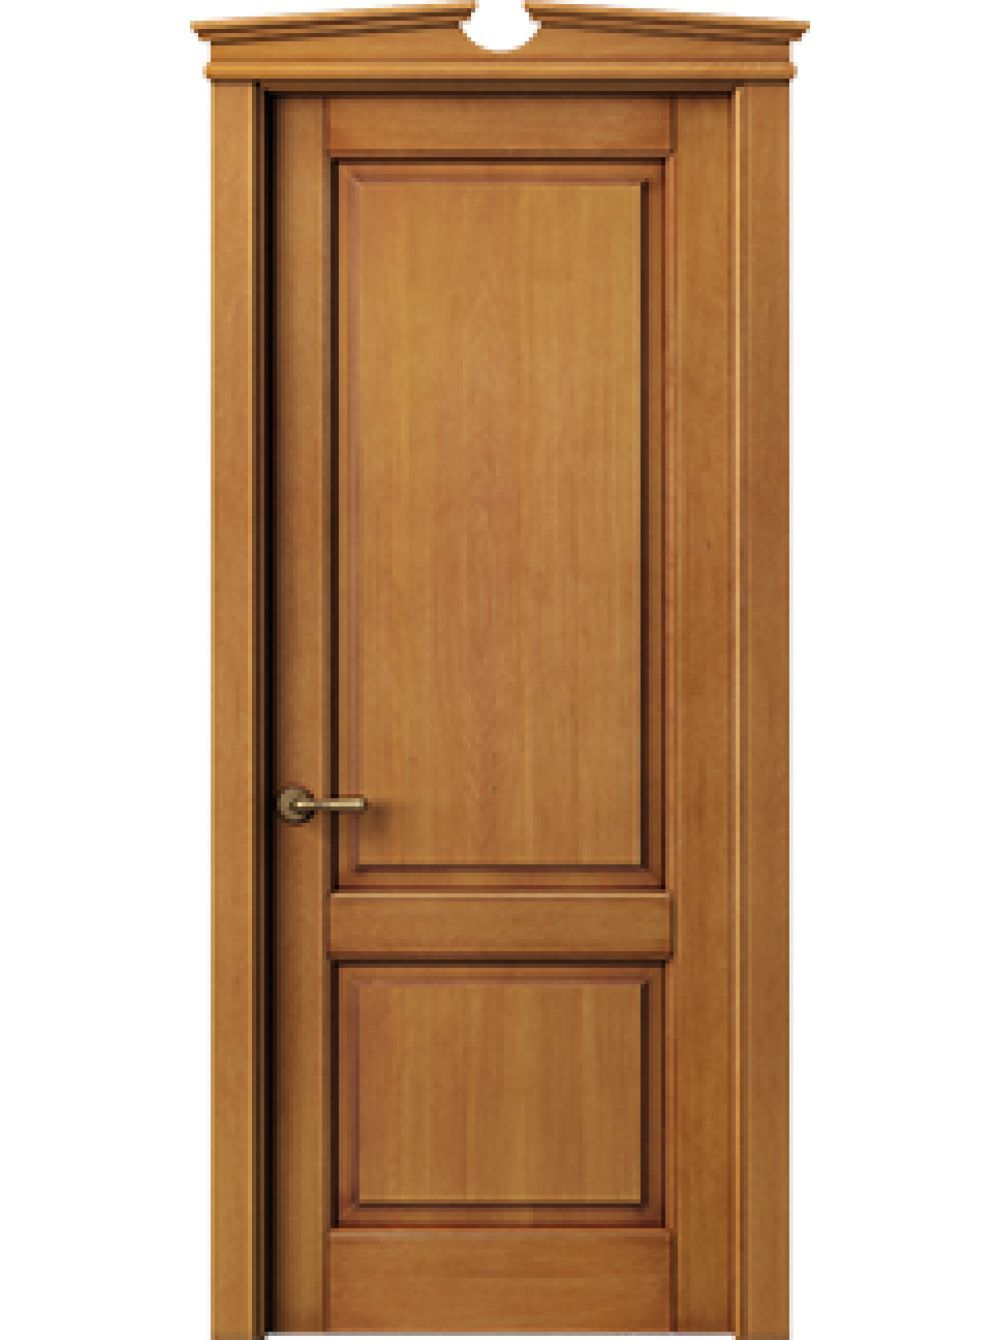 Sarto toscana plano 6303 interior door beech light patina - 32x80 exterior door rough opening ...